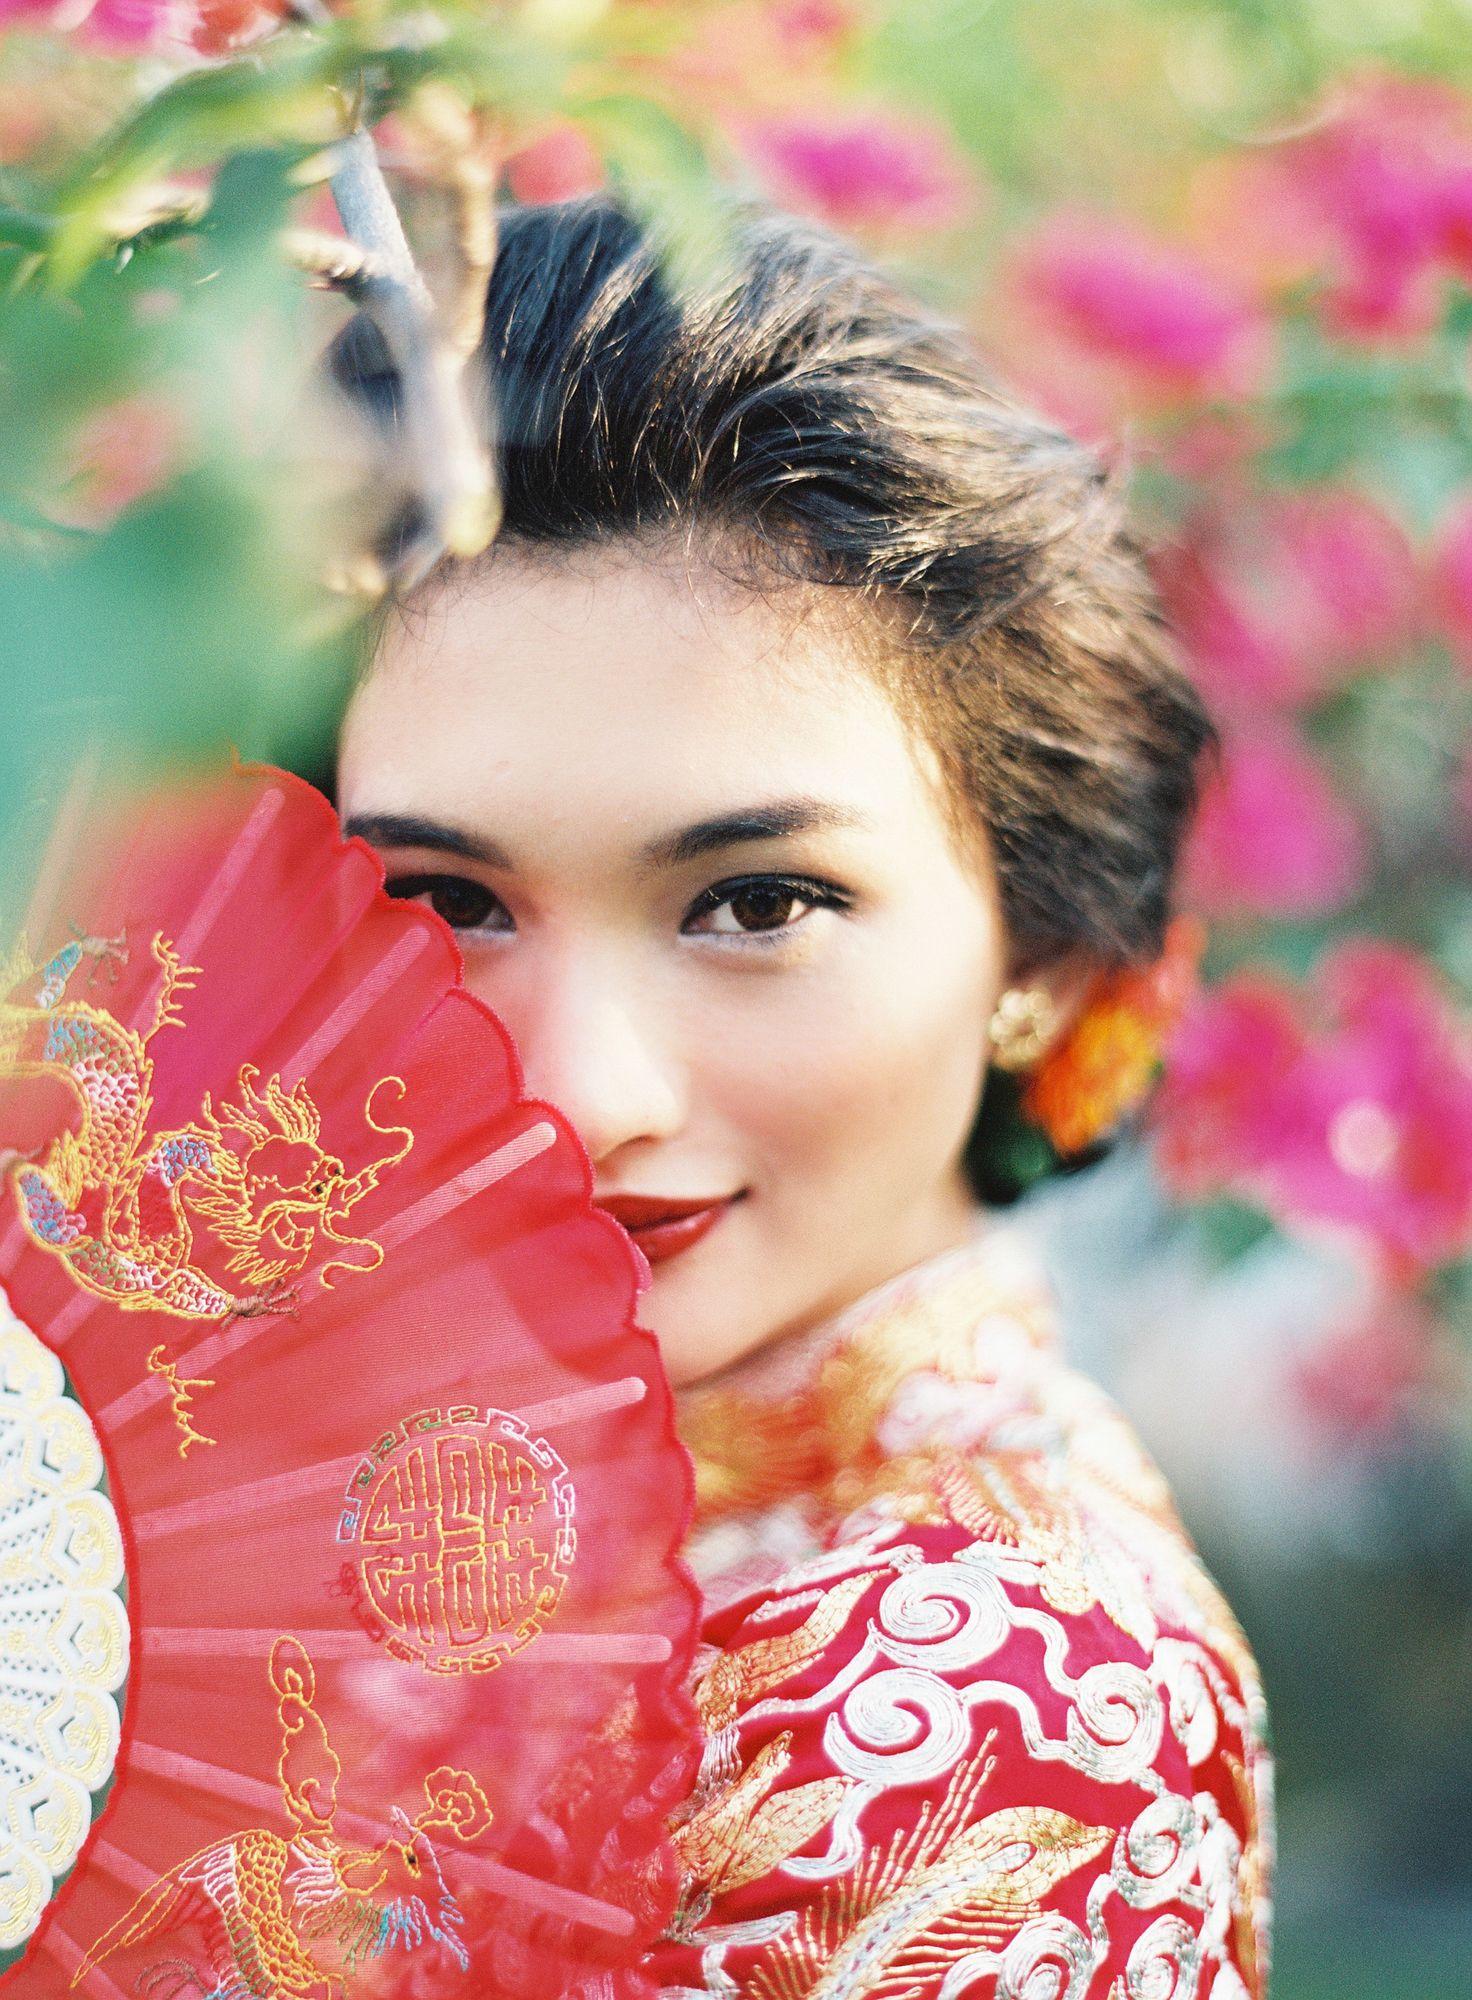 中国婚礼之新娘发型 the bride hairstyle of chinese wedding https